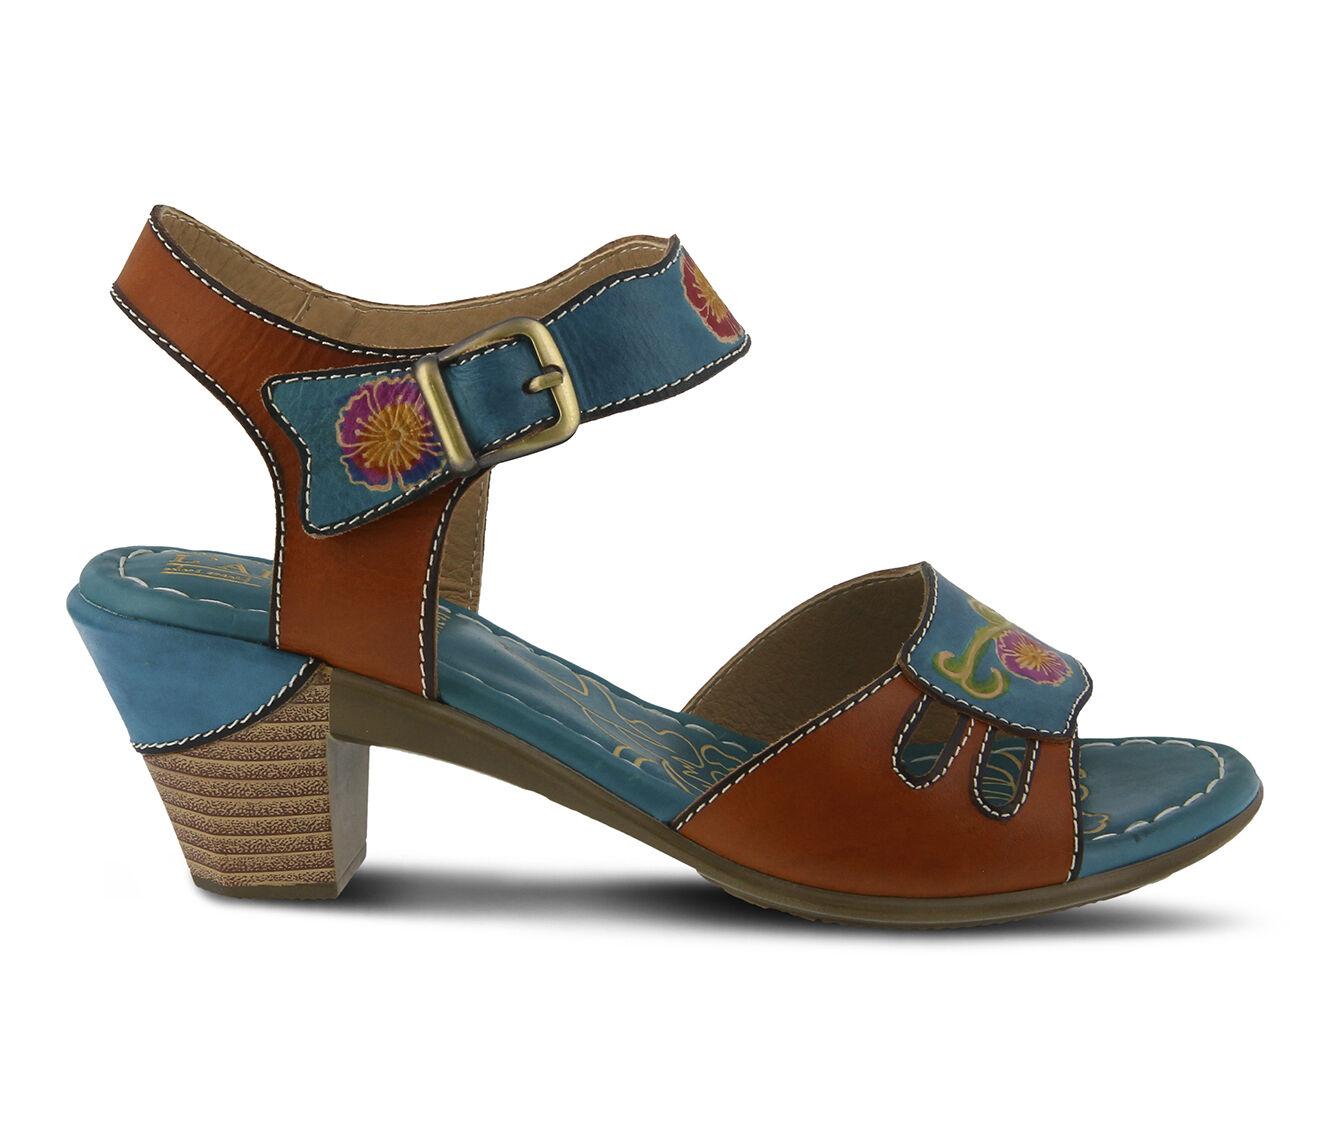 Women's L'ARTISTE Kyleta Dress Sandals Turquoise Multi